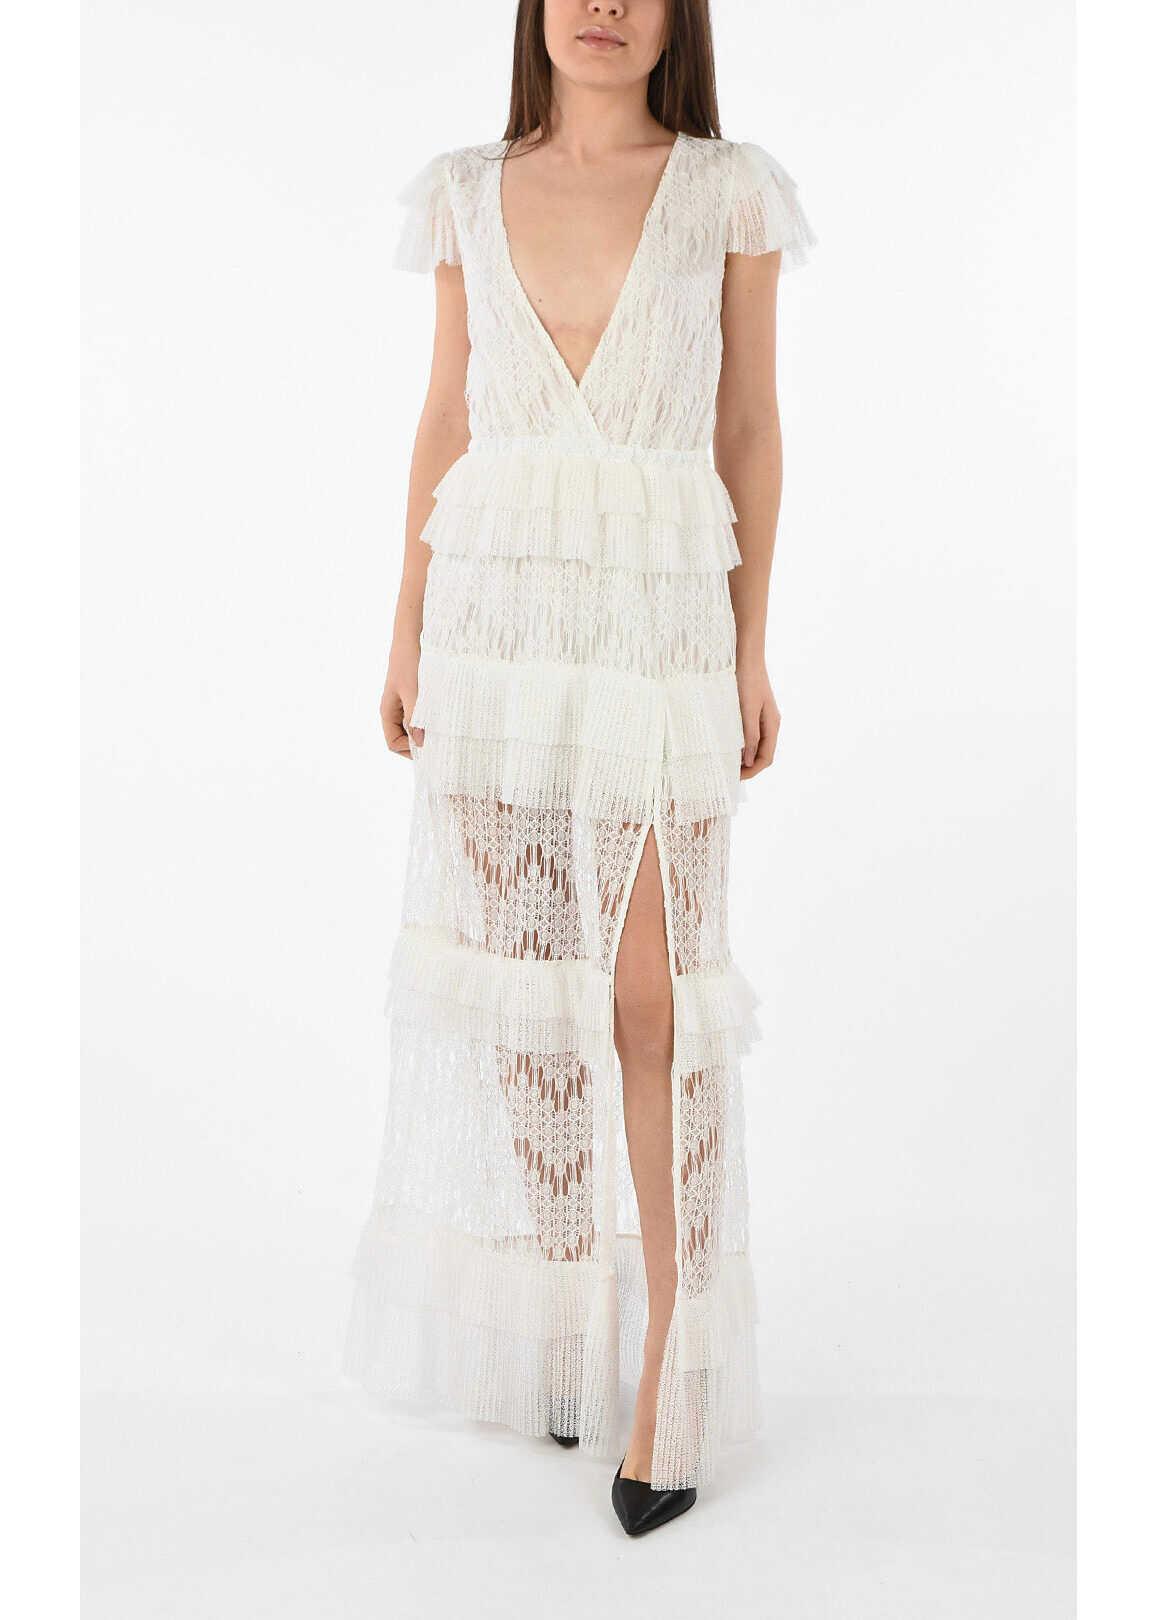 Just Cavalli Frill V-Neck Dress WHITE